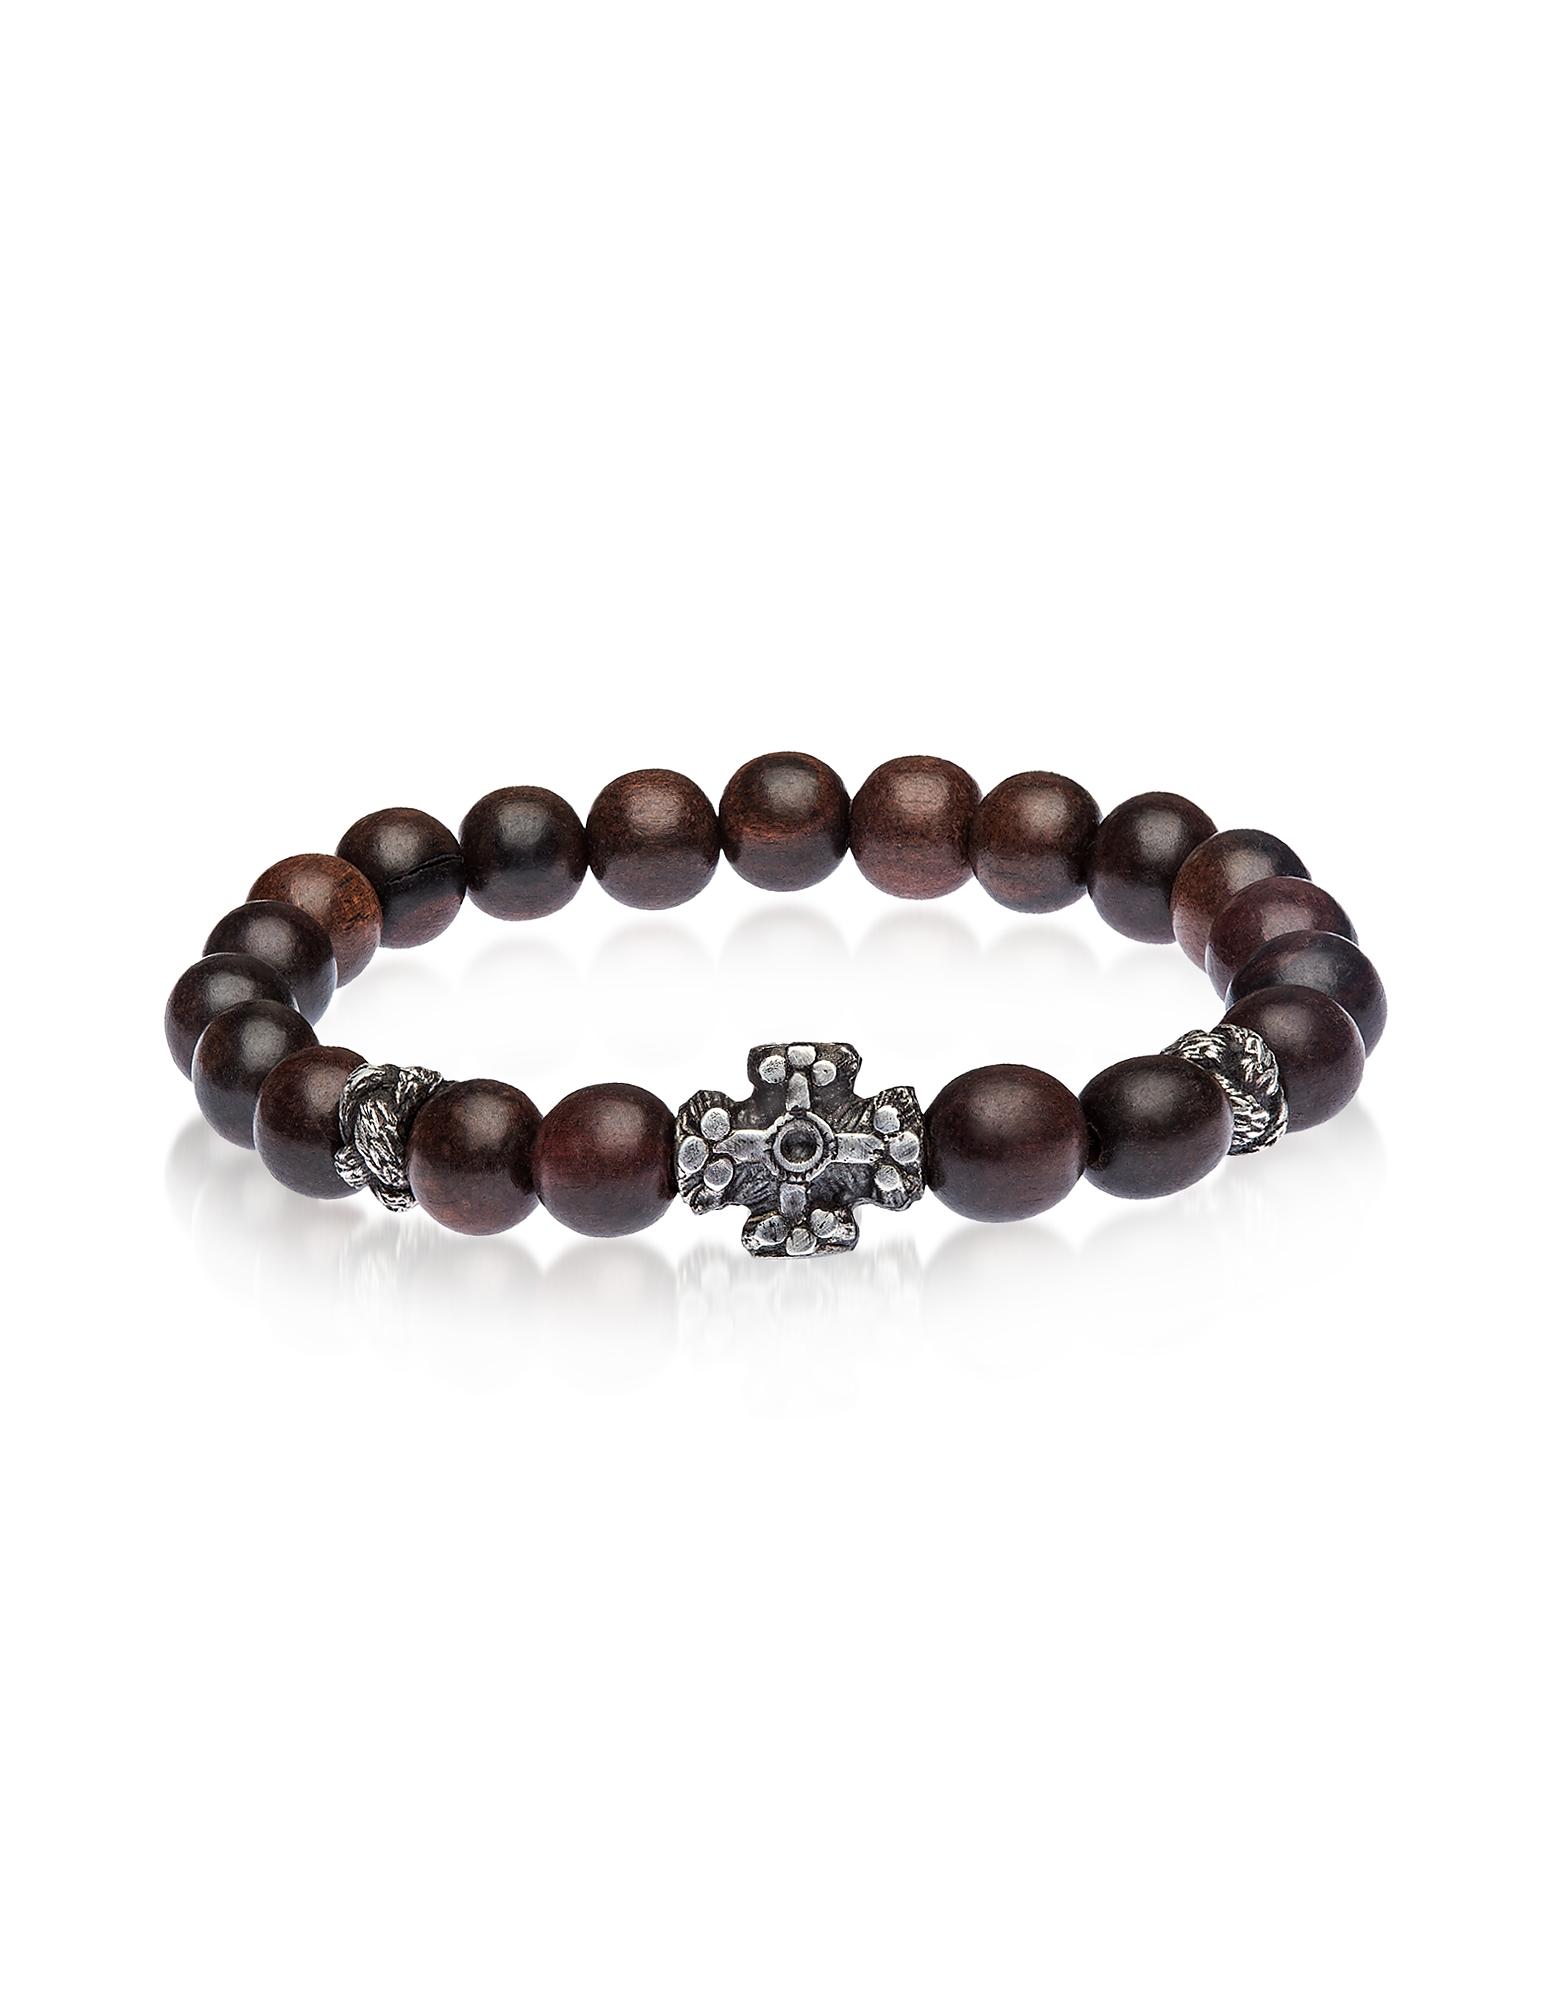 Antique Style Bracelet w/Ebony Beads